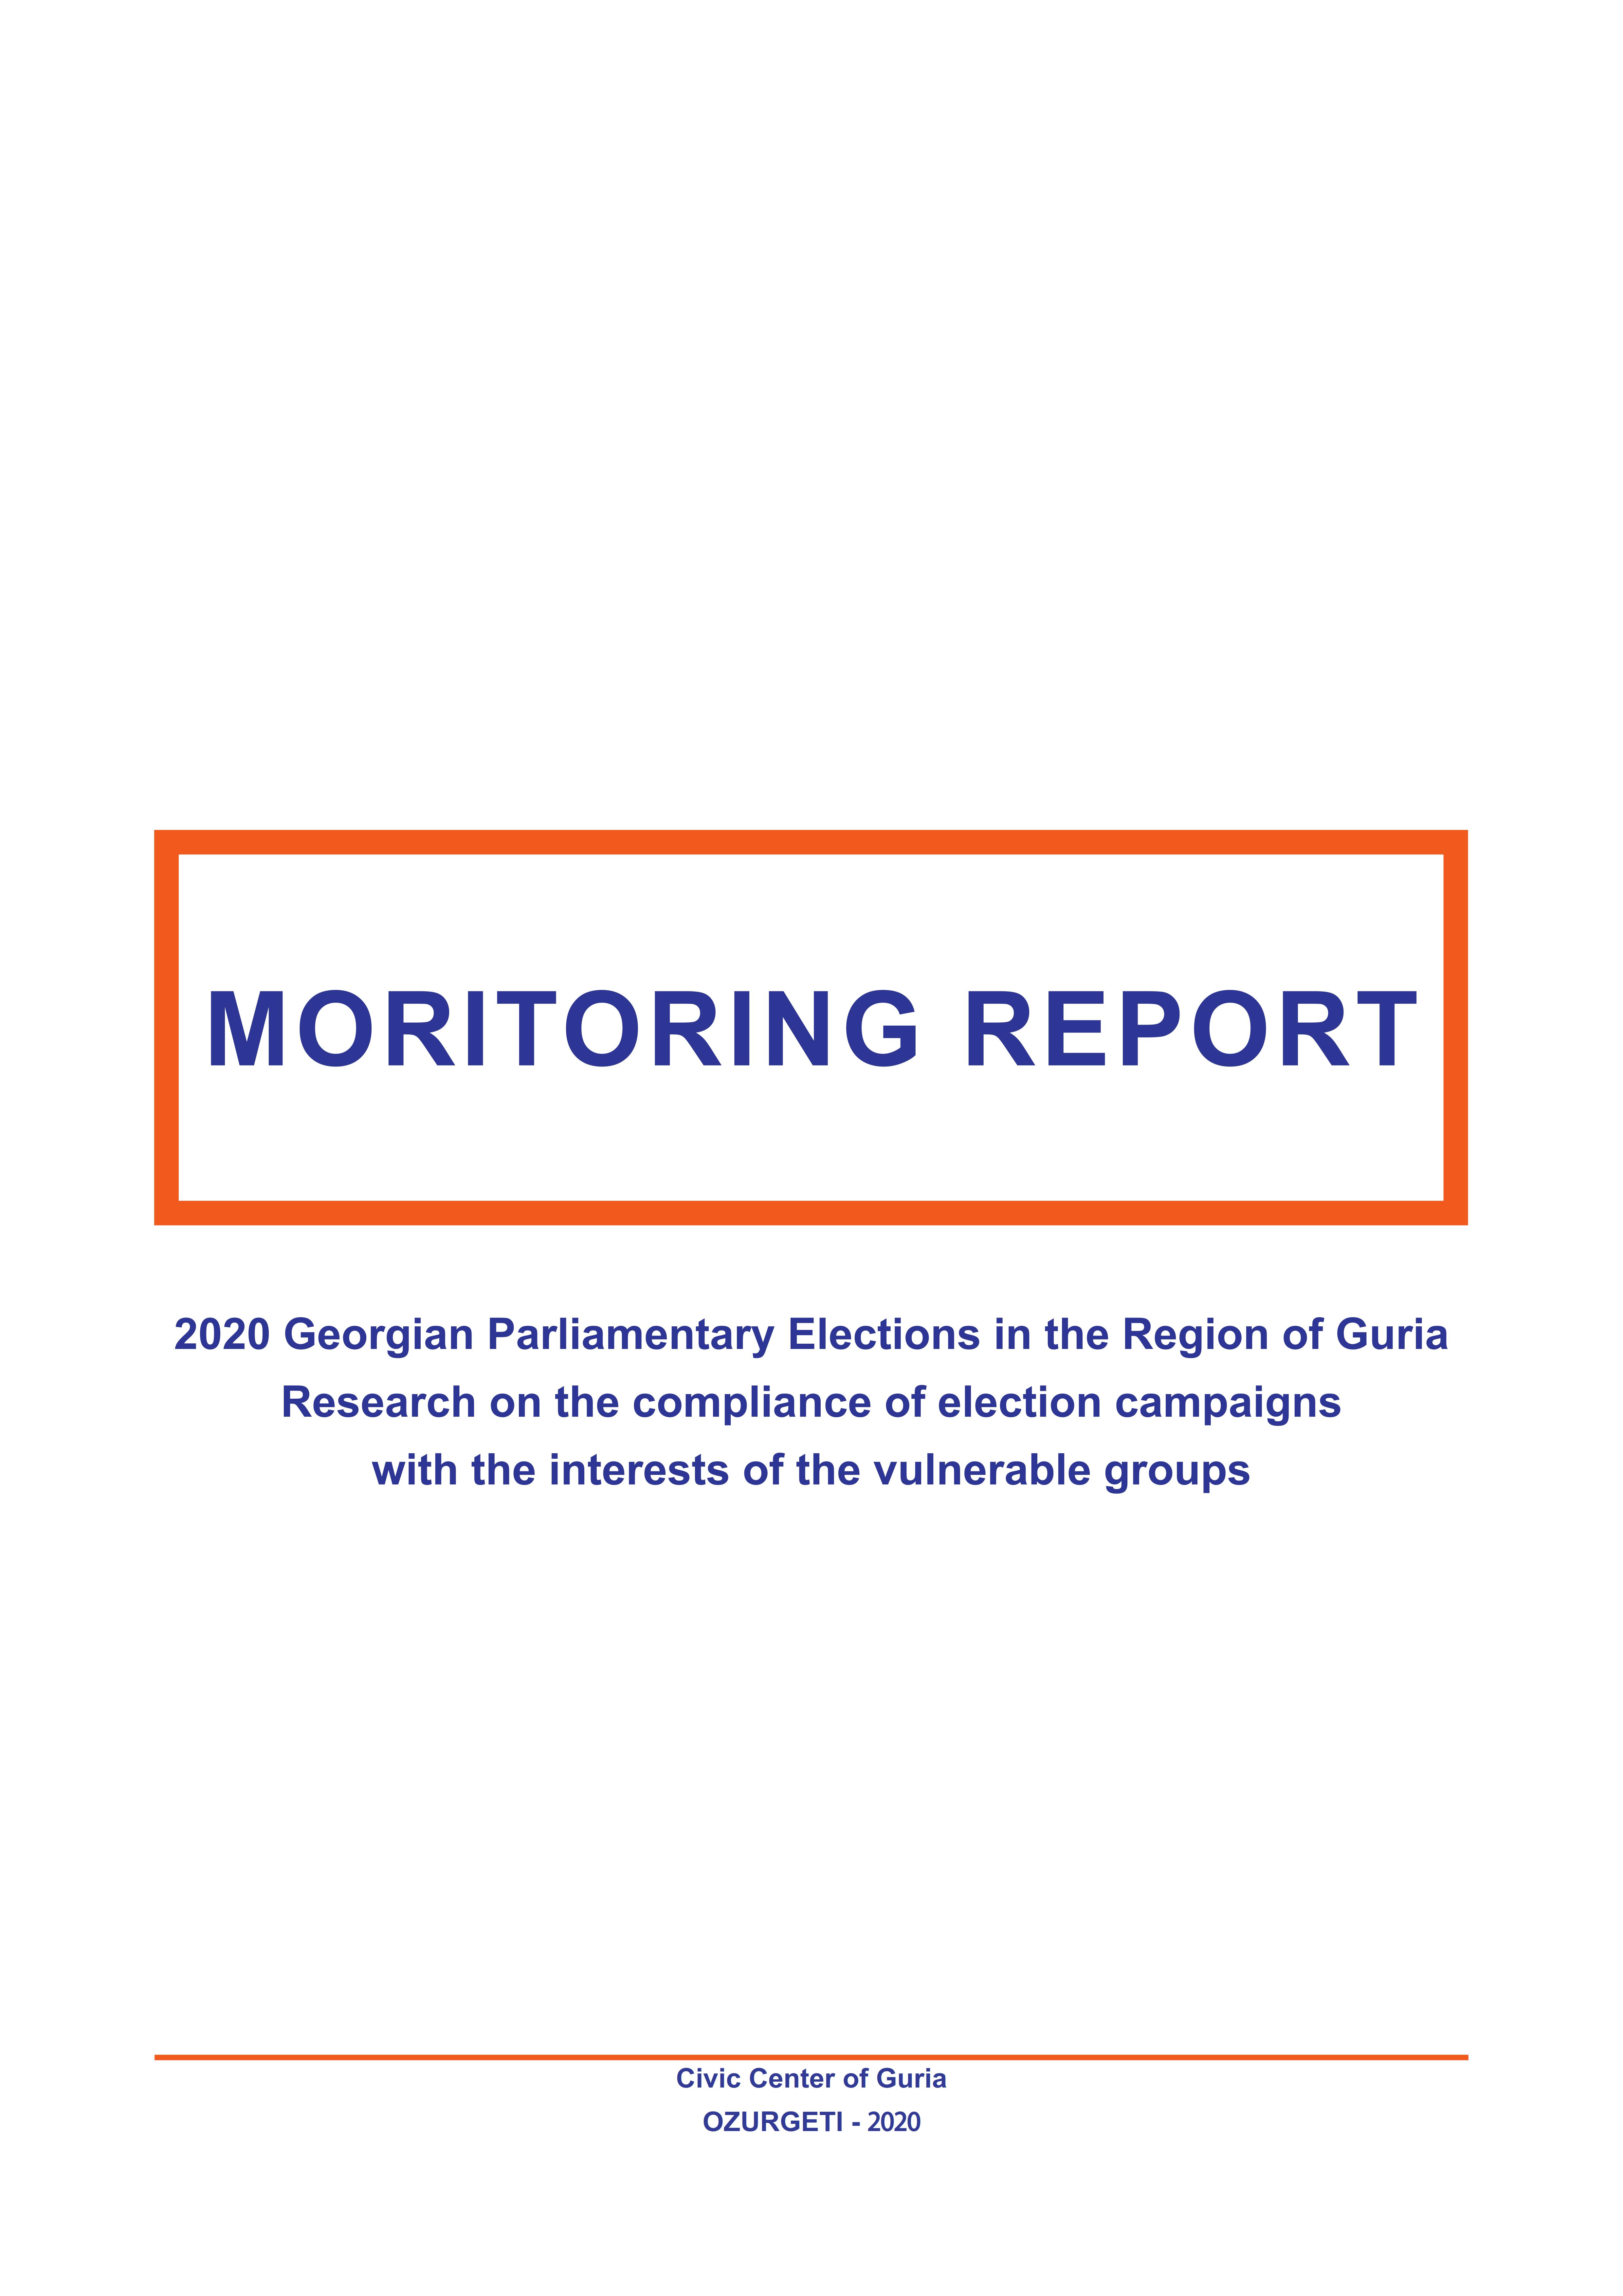 Monitoring Report